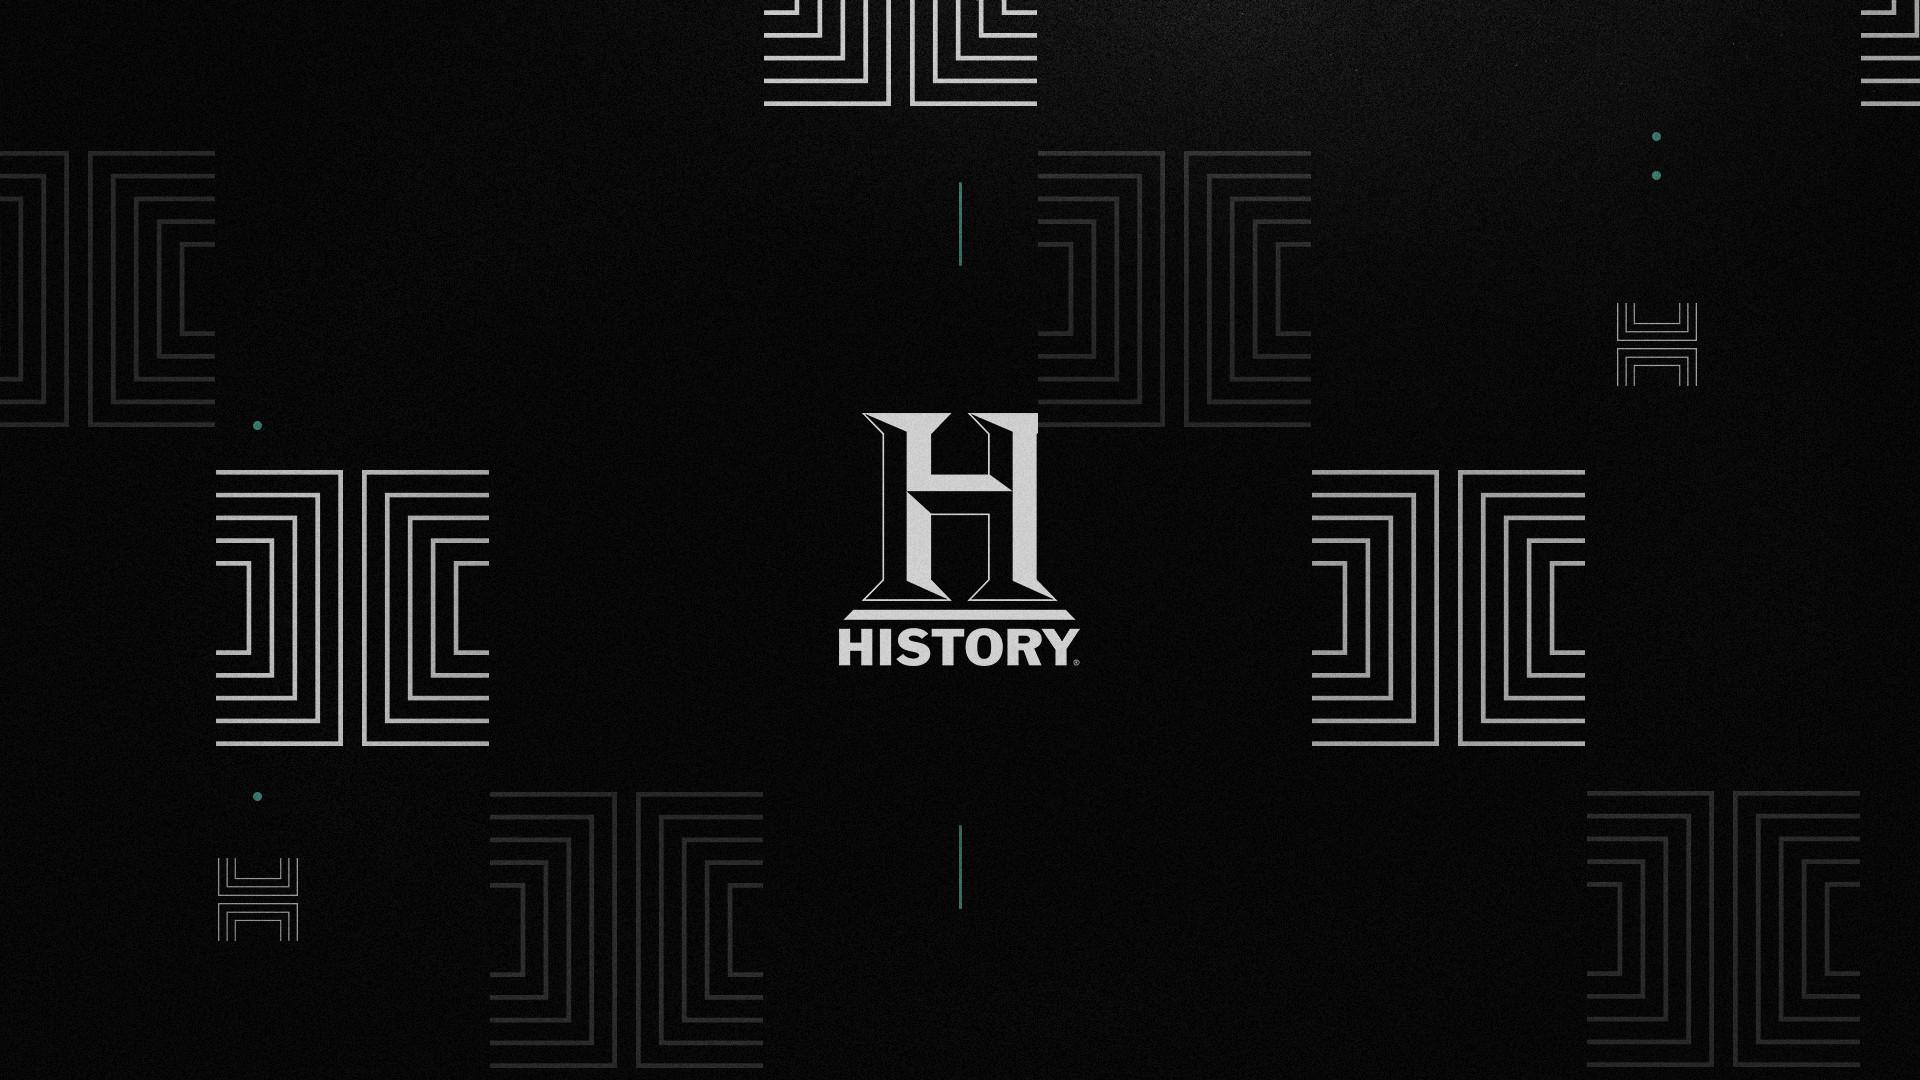 A+E_Upfront_History_02_transition.jpg